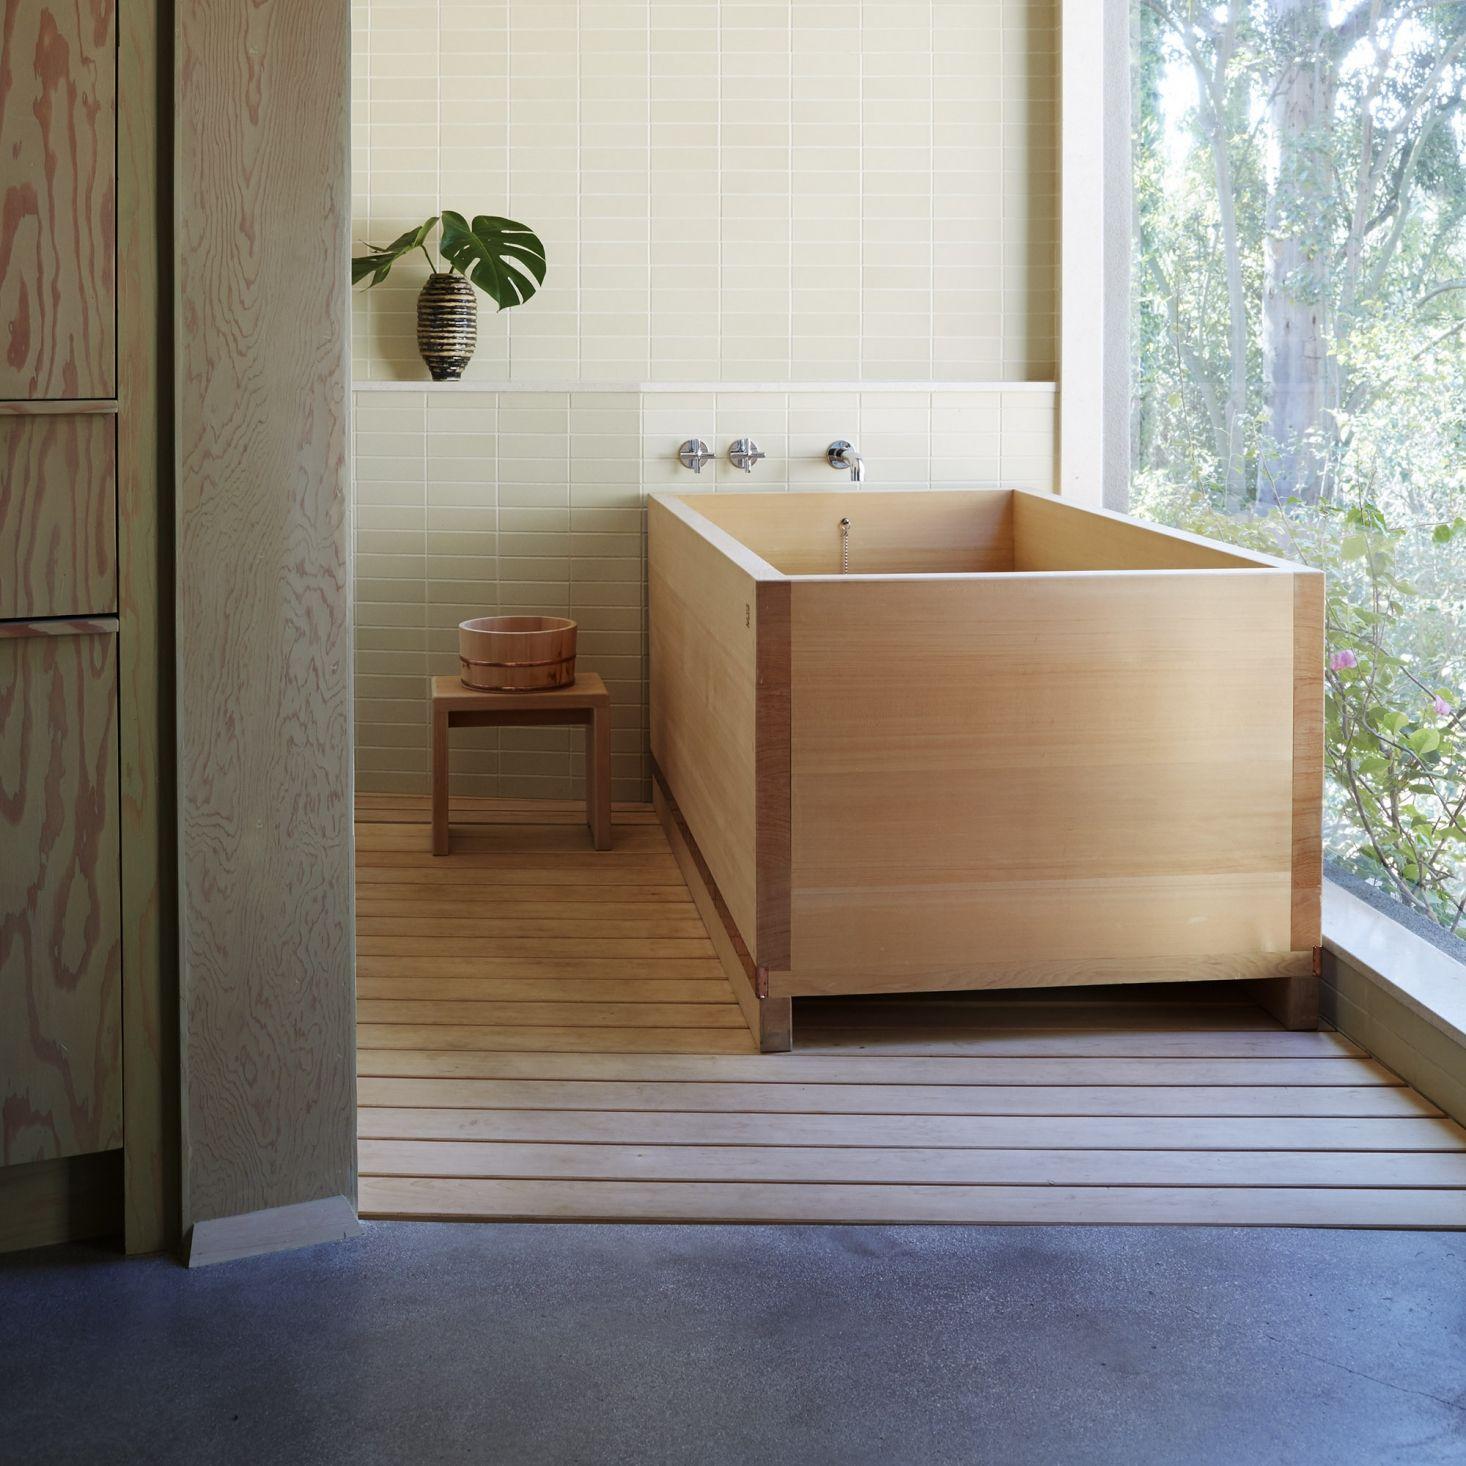 Japanese Hinoki Wood Bath Buckets High And Low Japanese Bathroom Design Spa Bathroom Design Japanese Style Bathroom